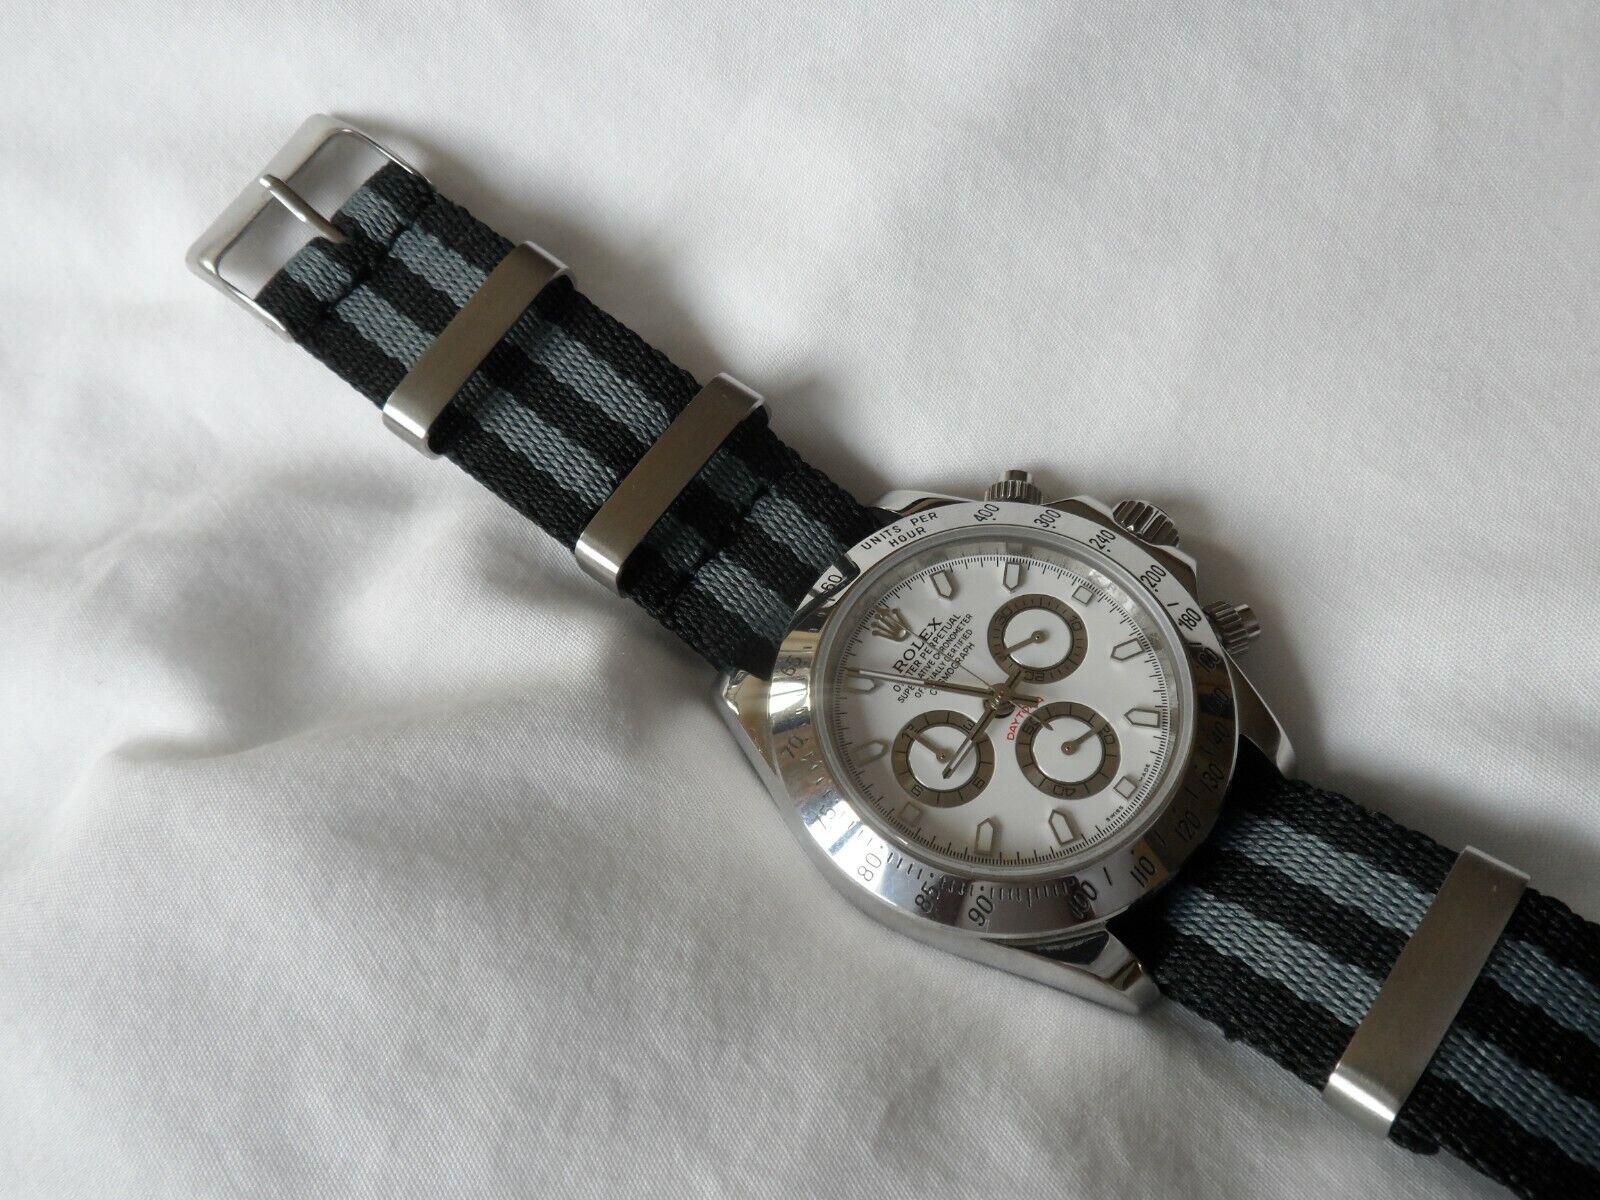 James Bond Watch Strap to fit Nato Strap fits Rolex Daytona